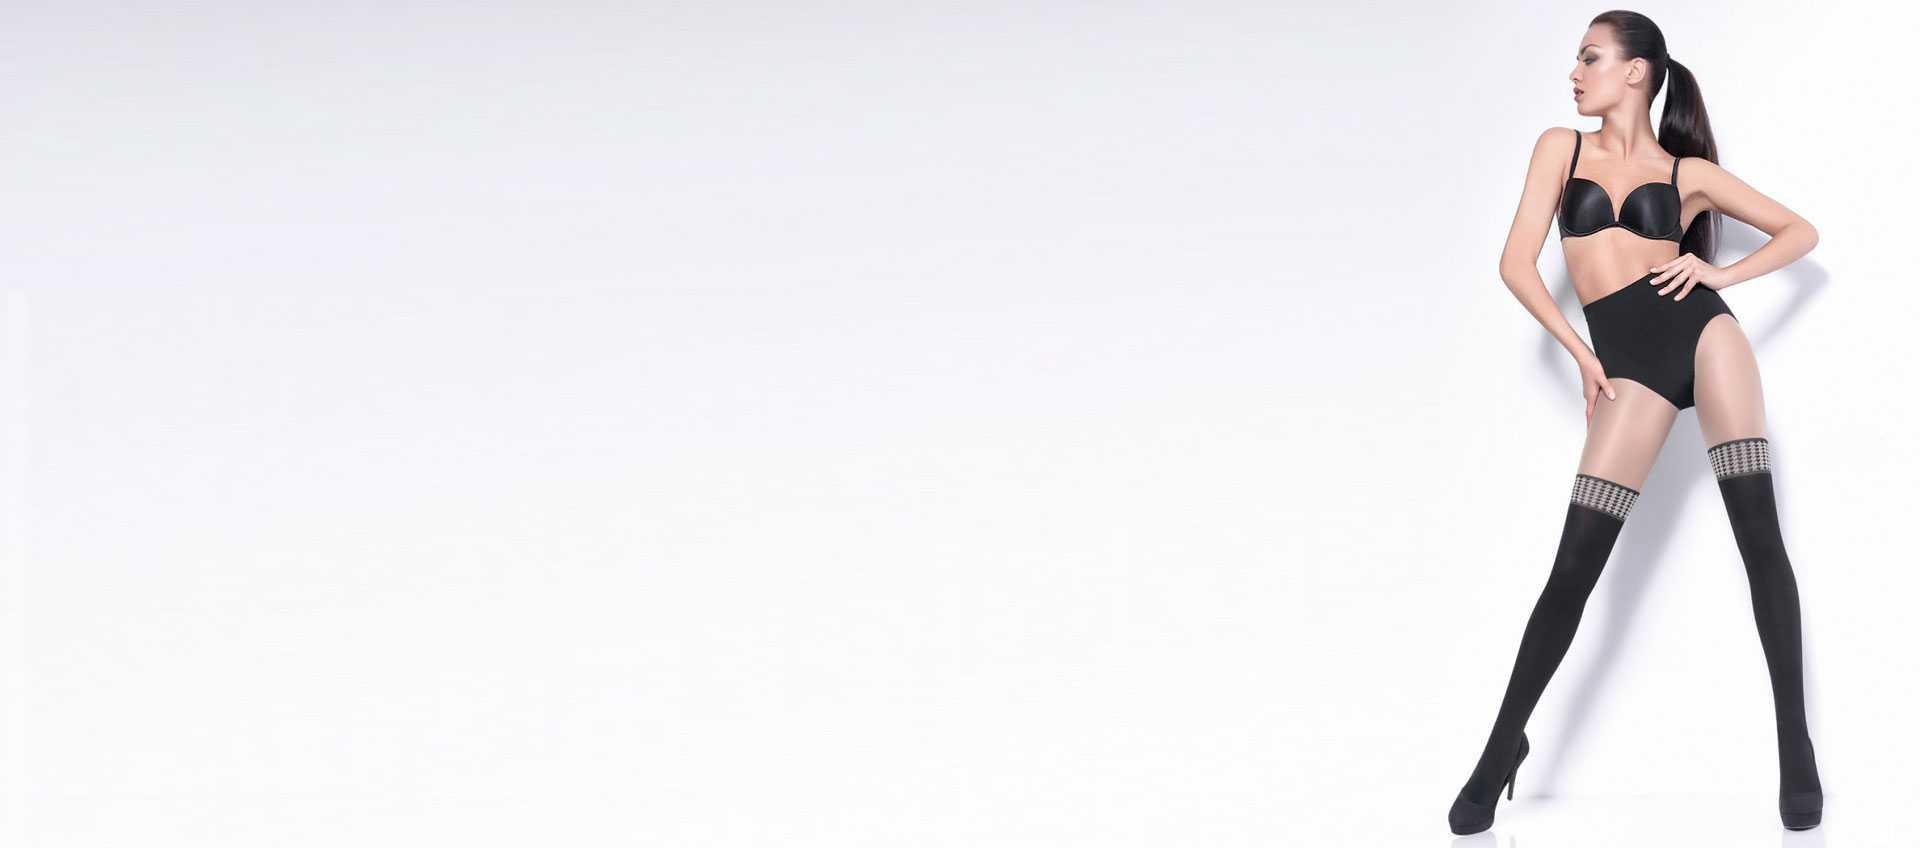 Нижнее белье оптом и в розницу - нижня білизна 40967b21037dd